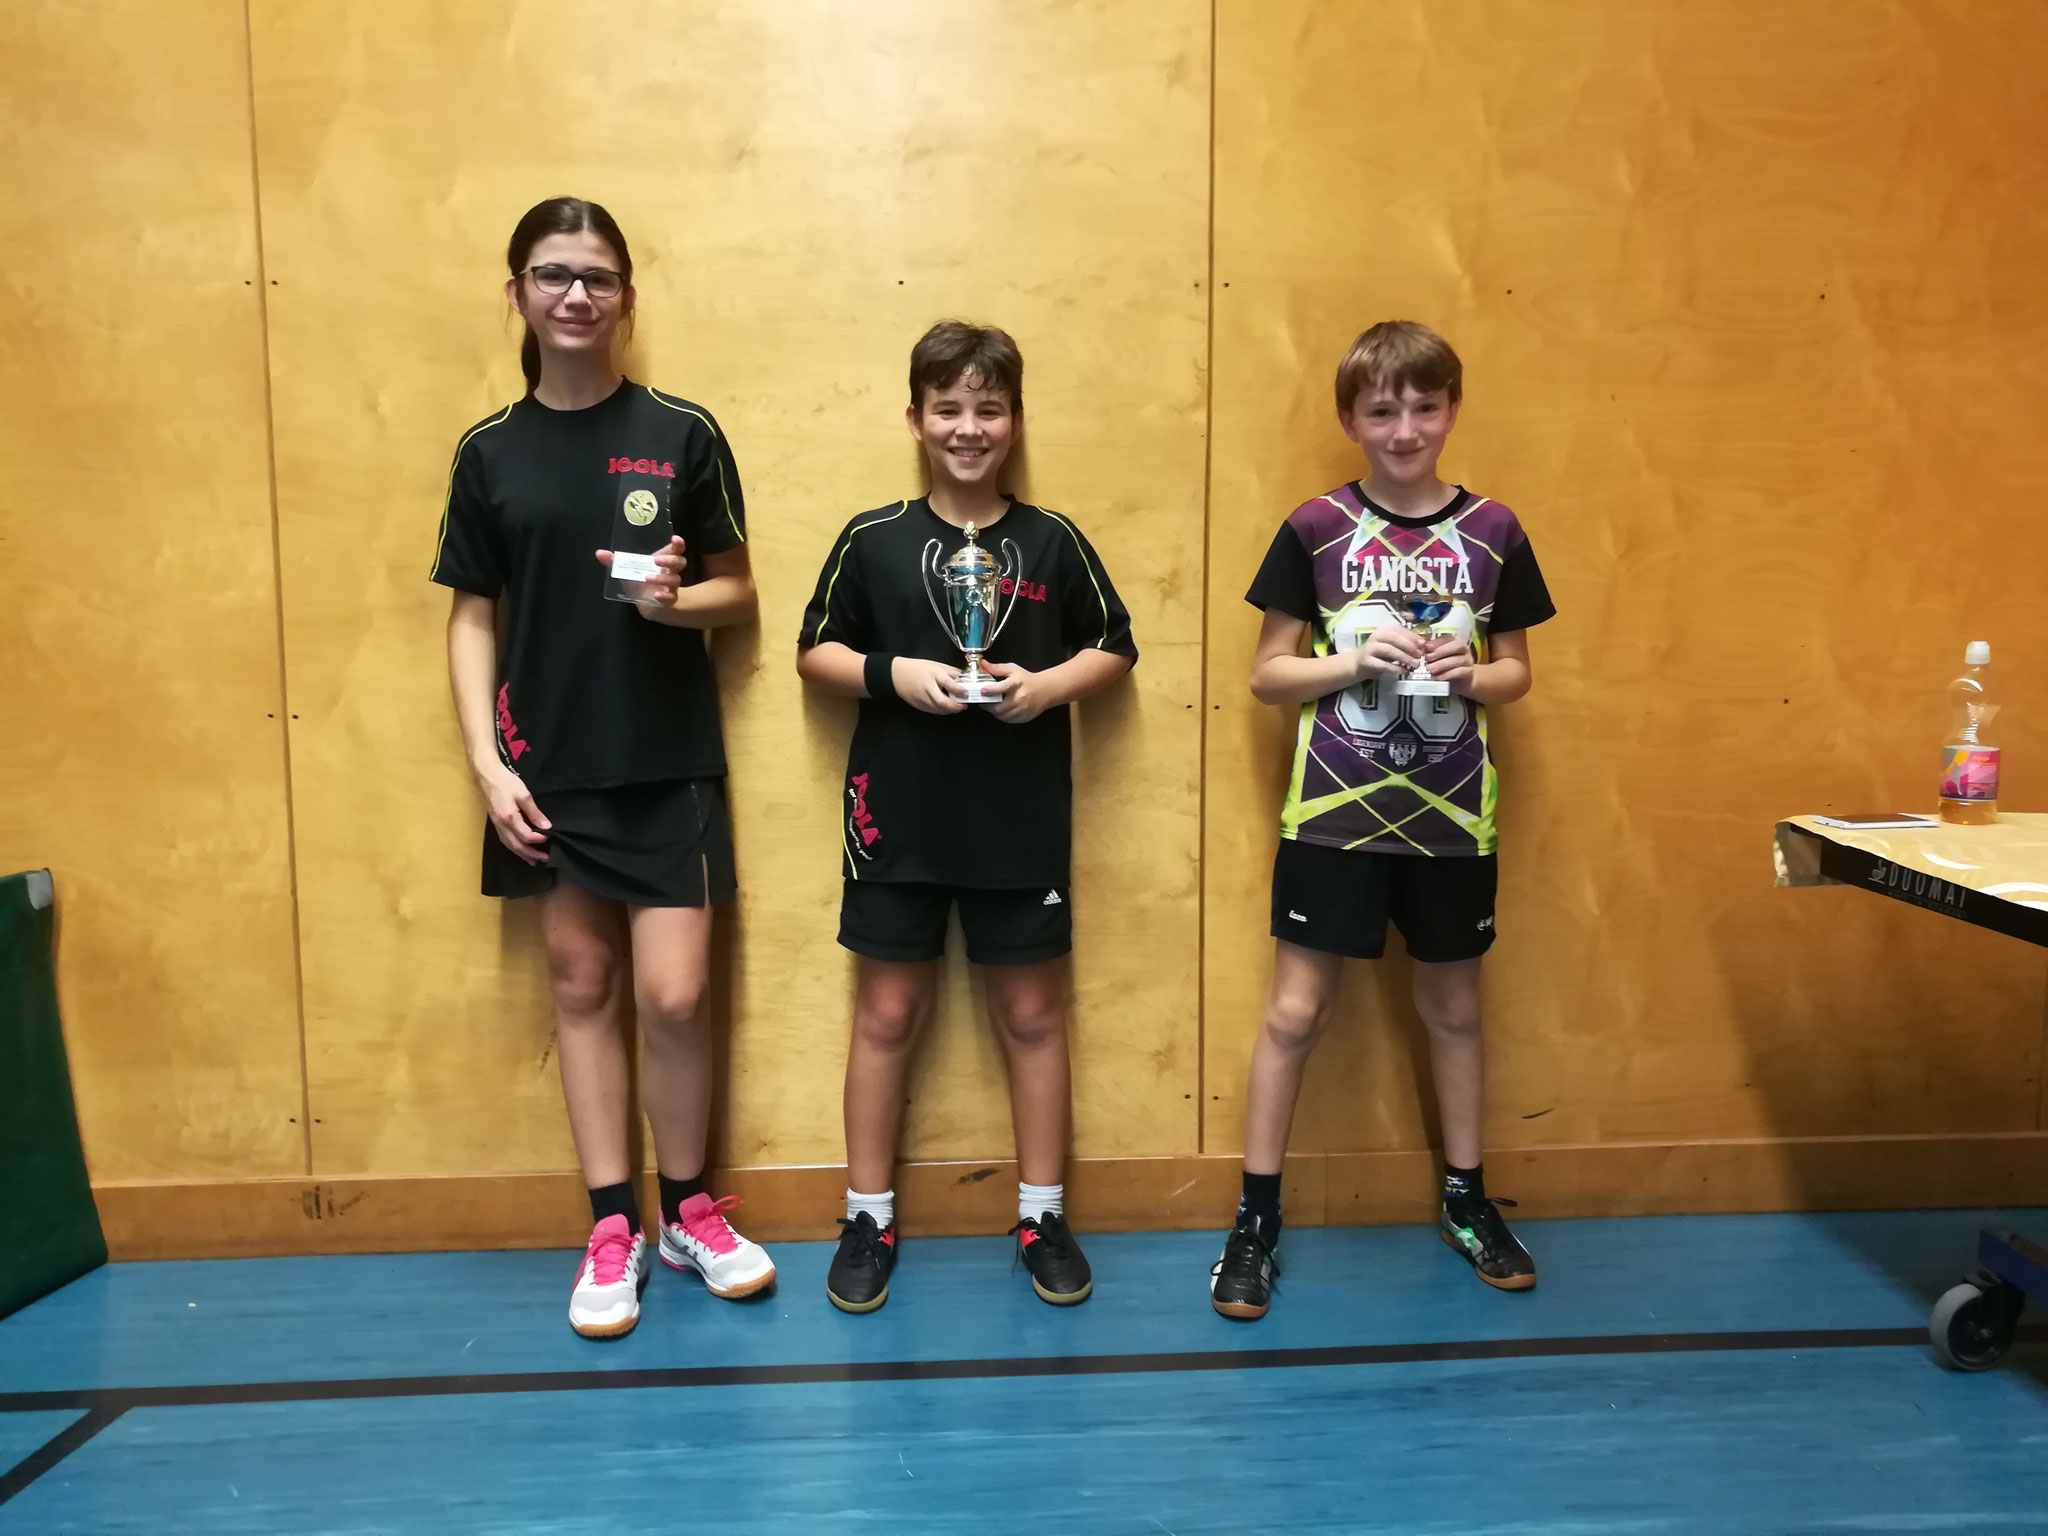 Siegerfoto Bewerb U13: v.l.n.r. Claire Mousset (OLY) (Platz 2), Filip Dzoic (OLY) (Sieger), Luca Sitzmann (OLY) (Platz 3)